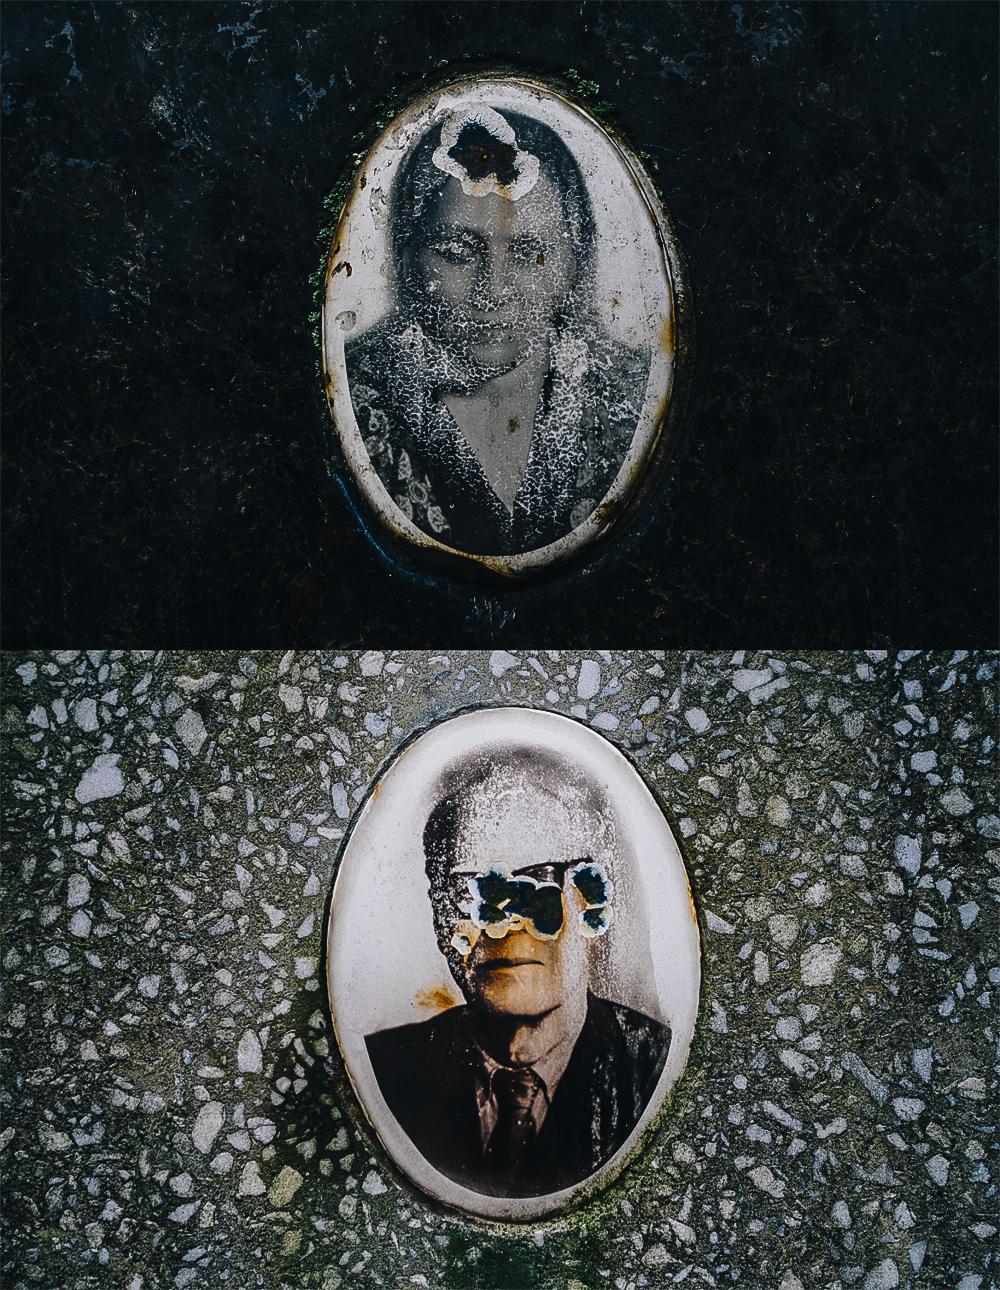 Retratos del cementerio de Baikove en Kiev, Ucania. ©Pedro J. Saavedra